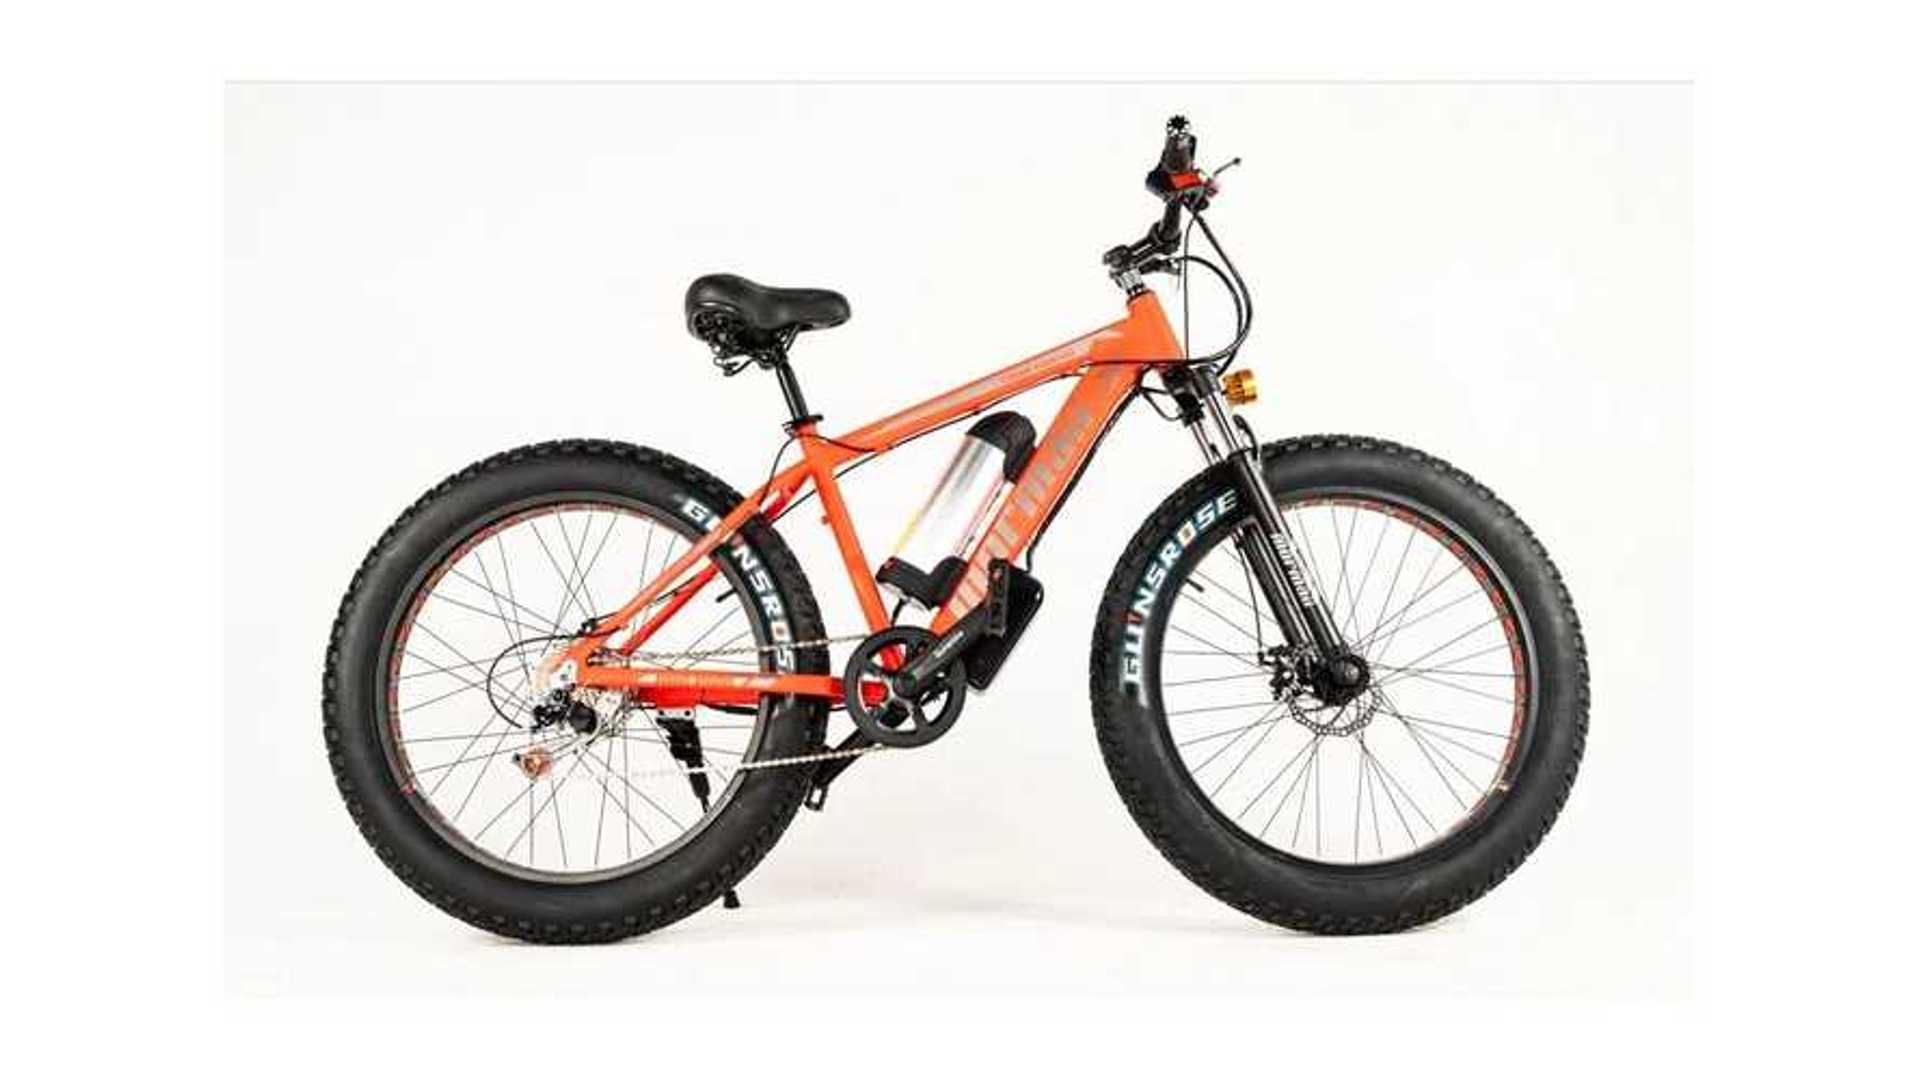 https://cdn.motor1.com/images/mgl/4ByOZ/s6/bicicleta-eletrica.jpg